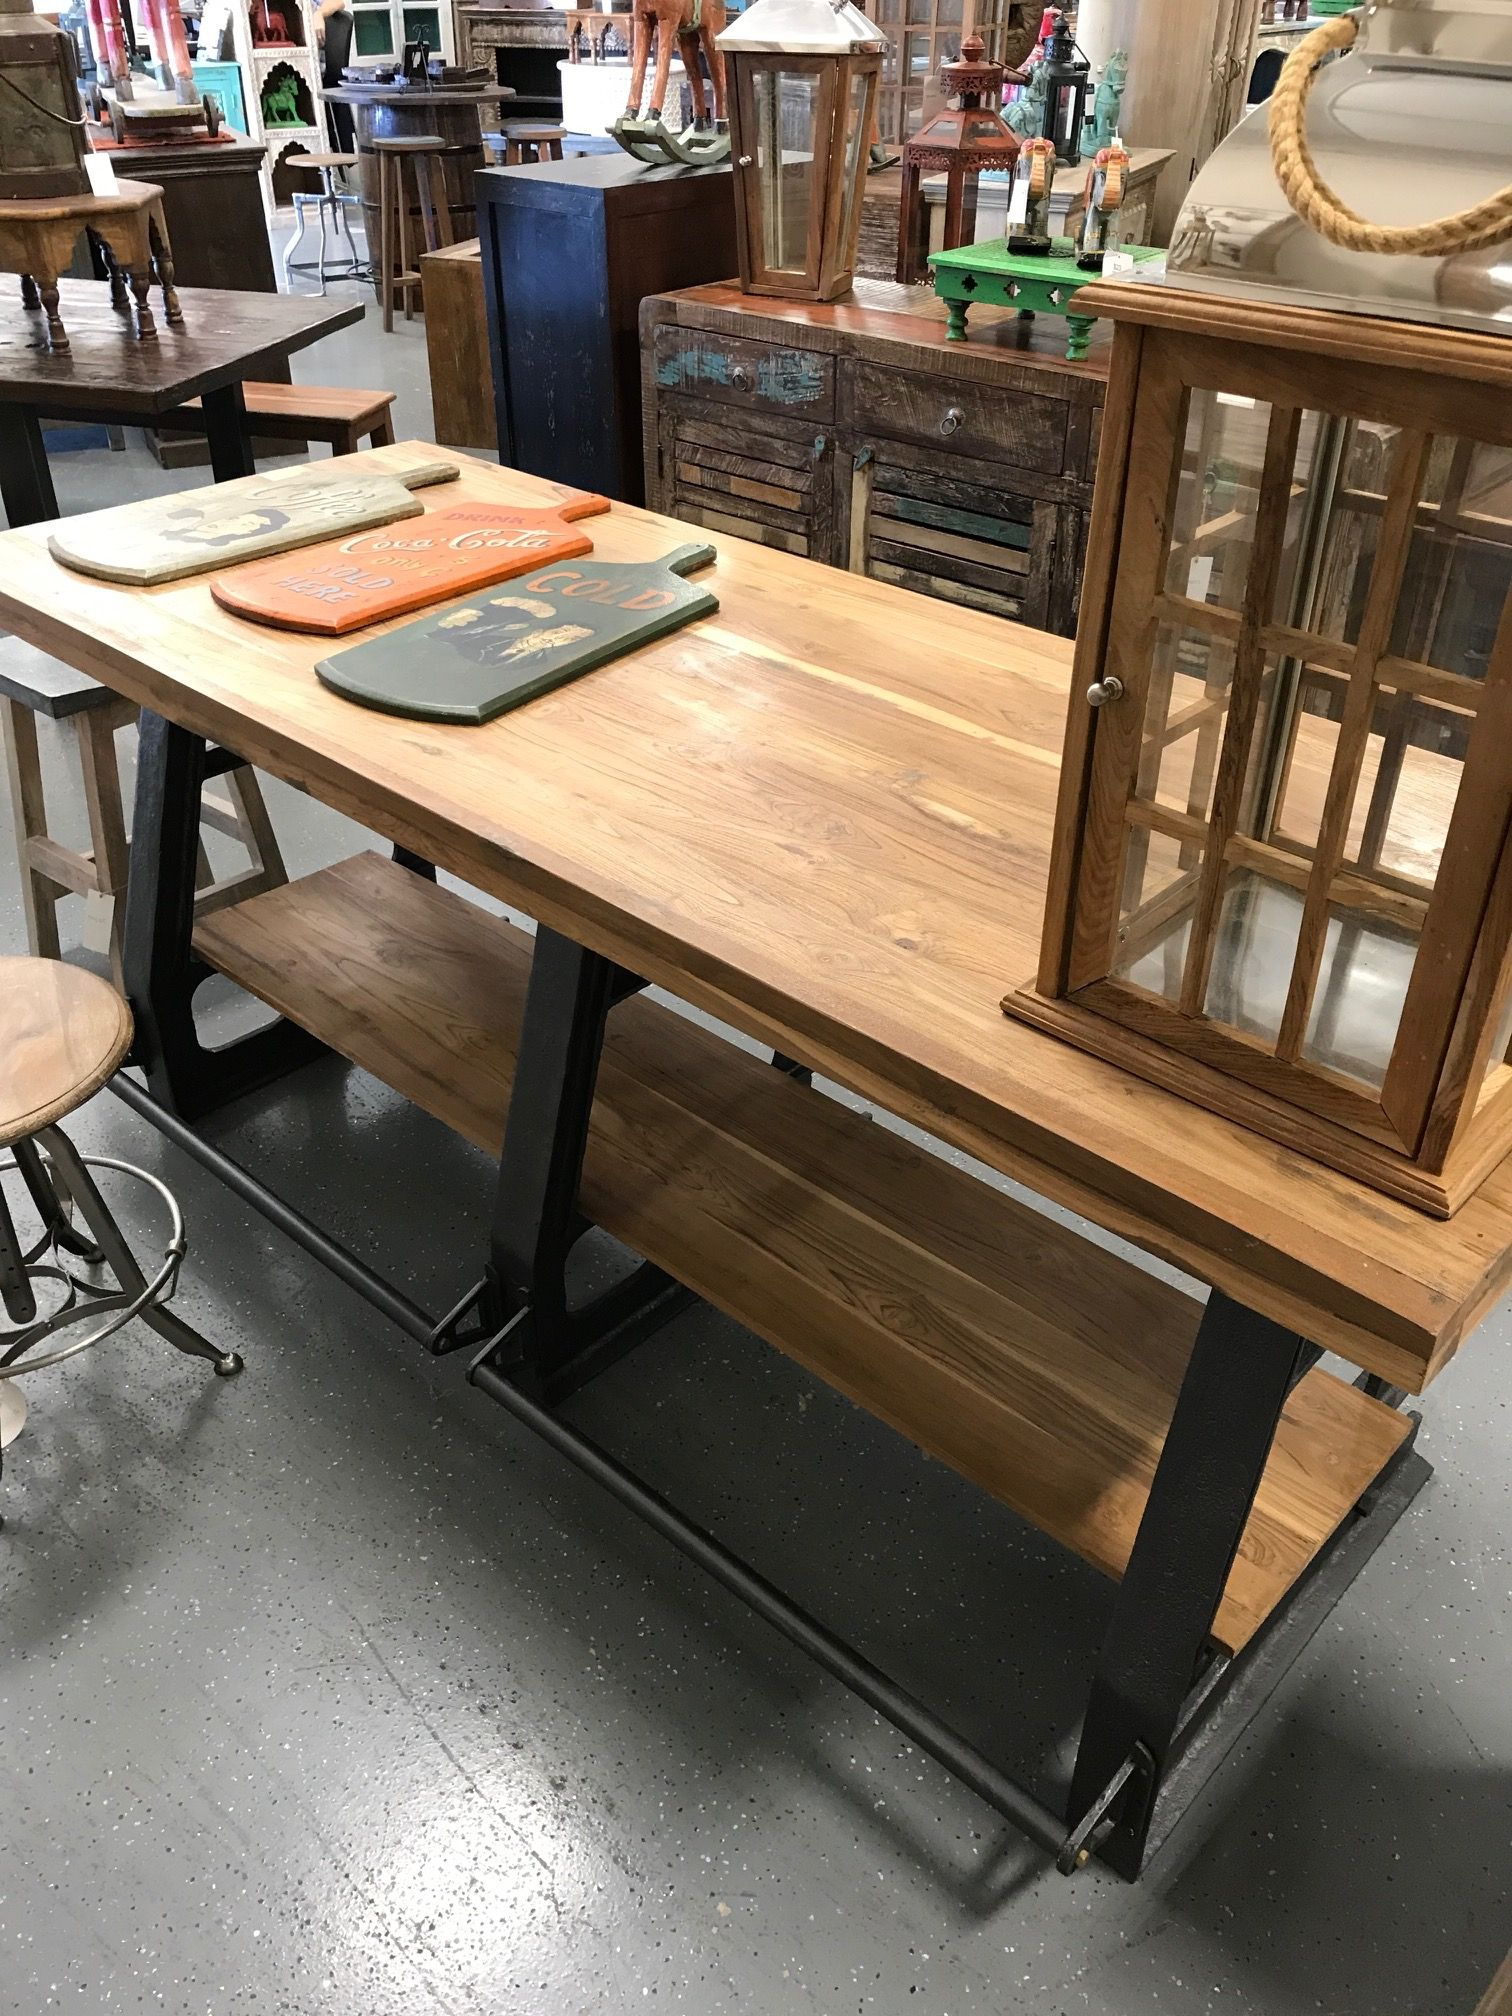 Industrial Furniture Store Located In Orlando Fl Artisan Furniture Orlando Offers A Wide Selection Of Quality Furni Artisan Furniture Furniture Wood Furniture